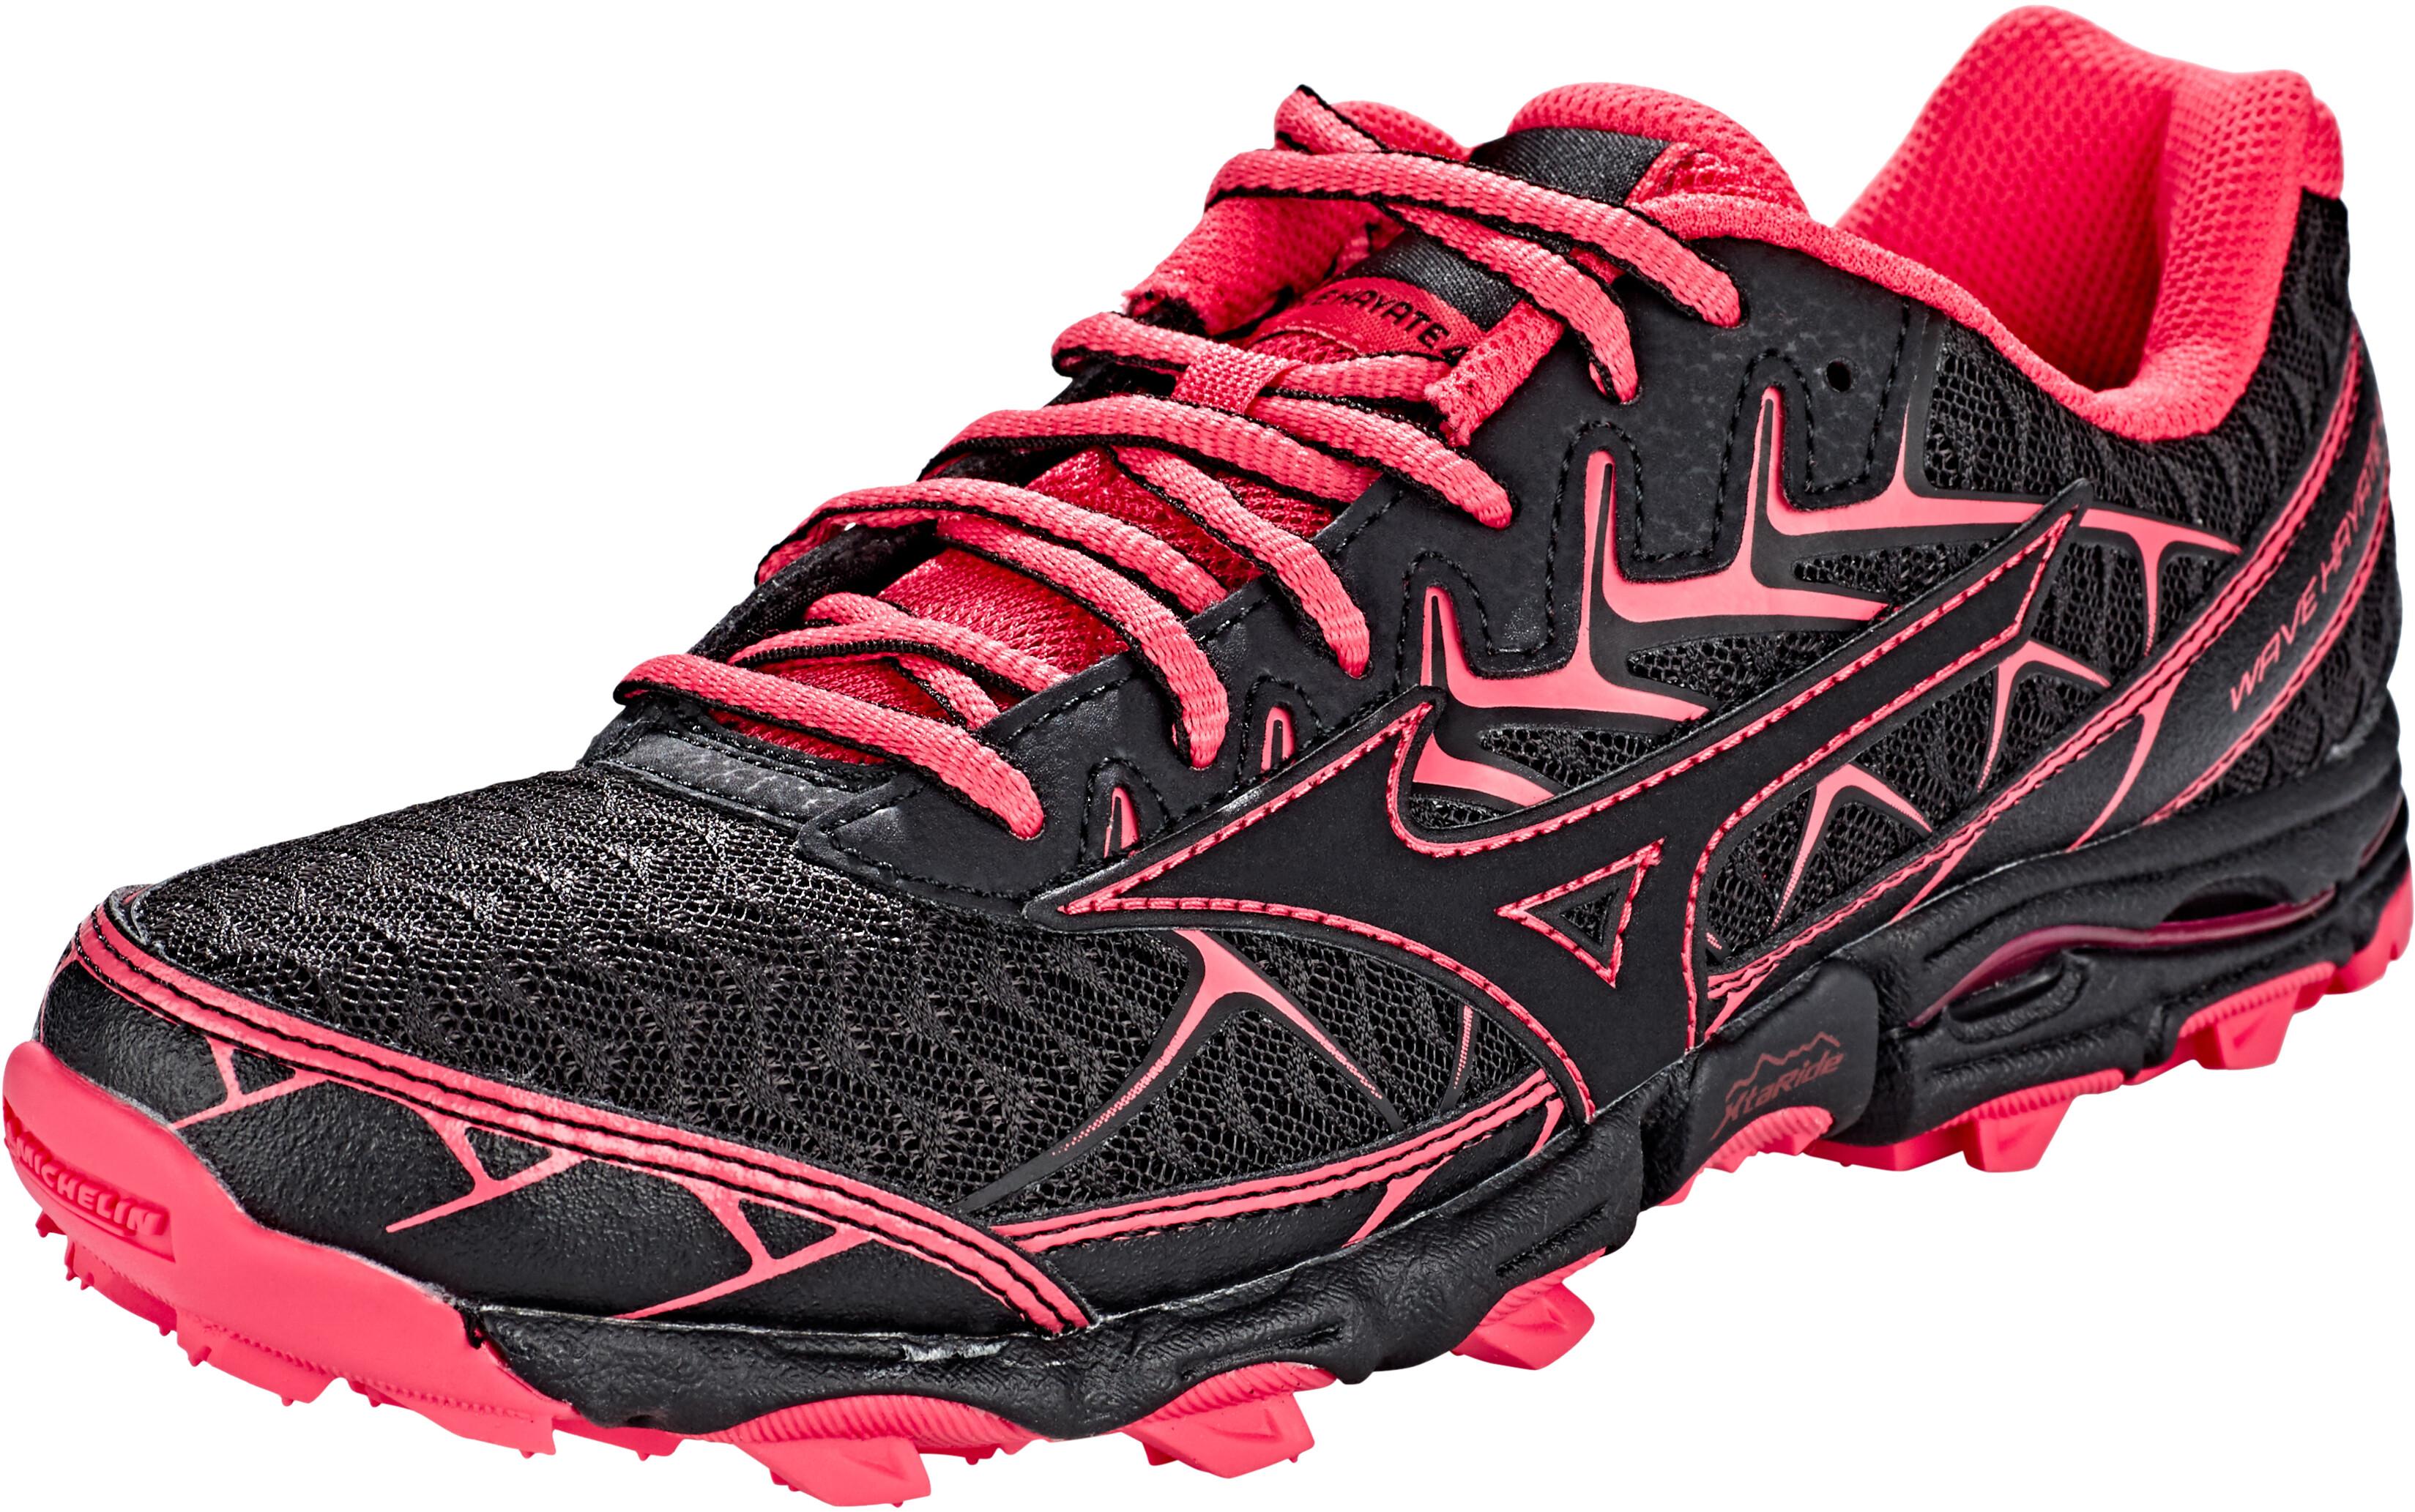 low priced 671be ad689 Mizuno Wave Hayate 4 - Chaussures running Femme - rose noir